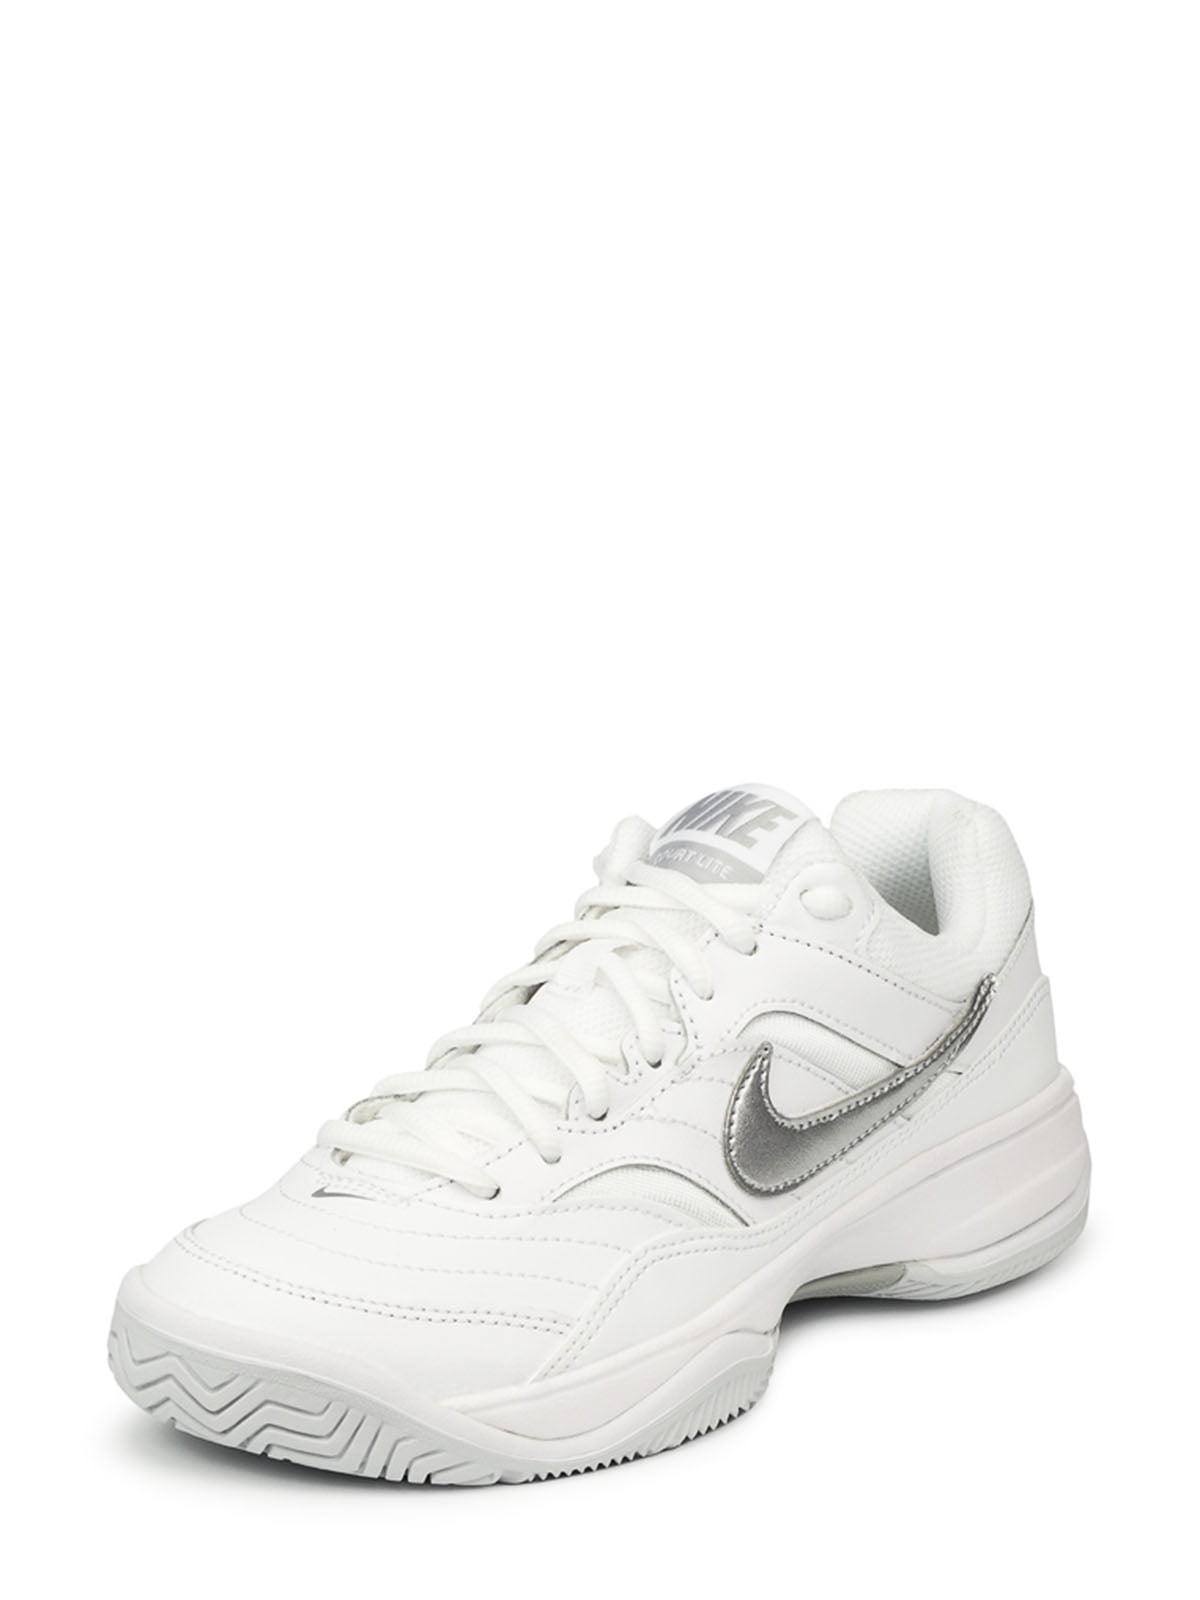 9b139776afb Кроссовки белые Wmns Nike Court Lite — Nike